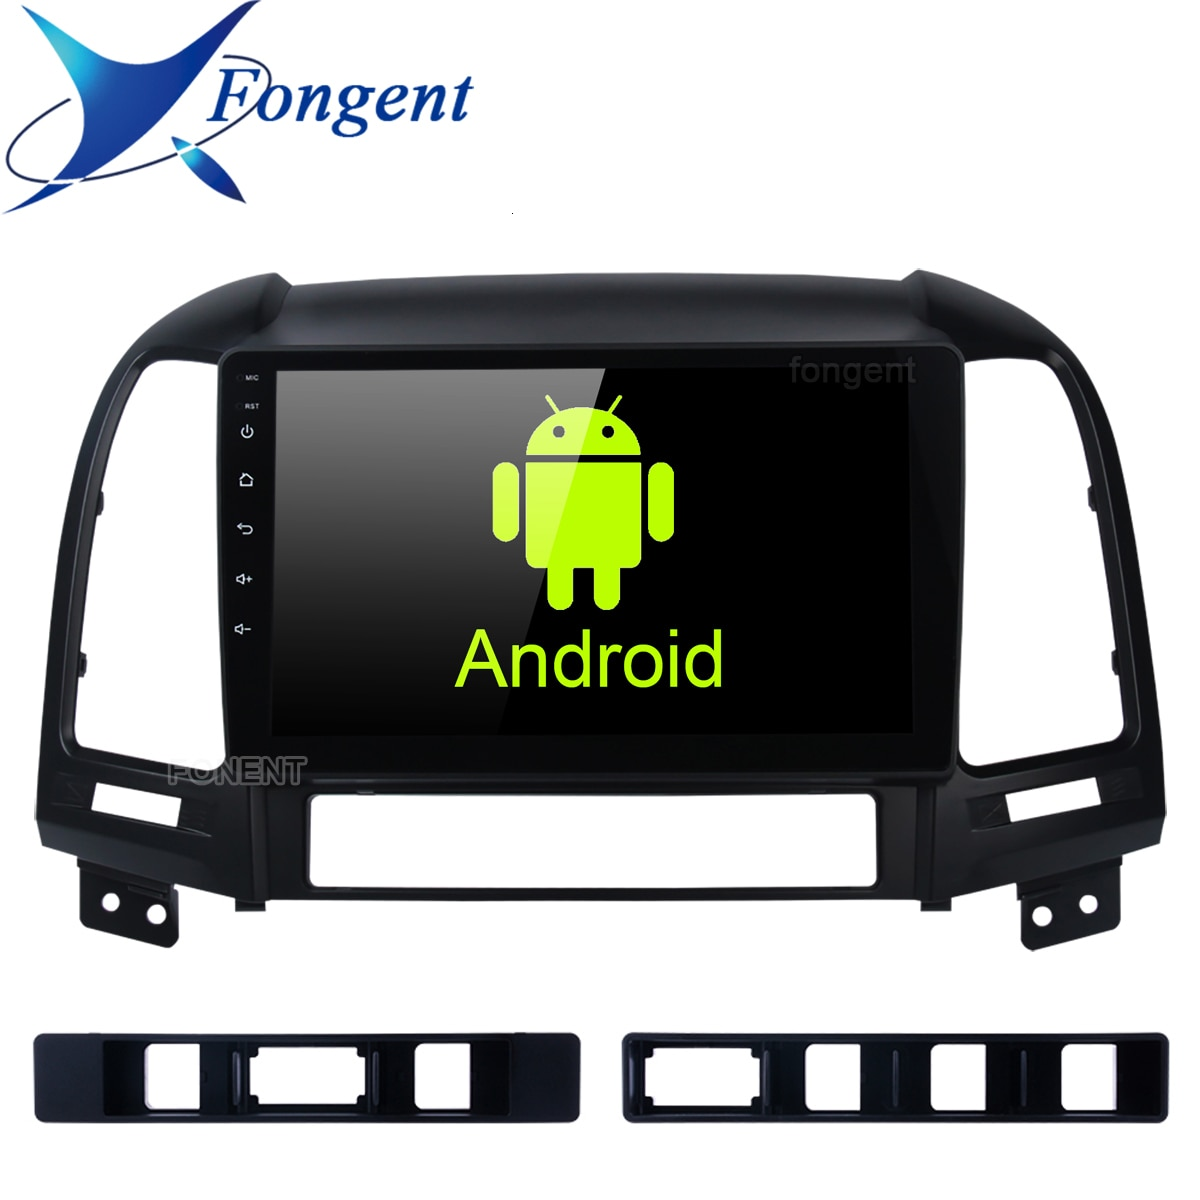 Für Hyundai Santa Fe 2005 2006 2007 2008 2009 2010 2011 2012 Android 9,0 Auto Radio Multimedia Player Gps Kopf einheit Stereo Audio